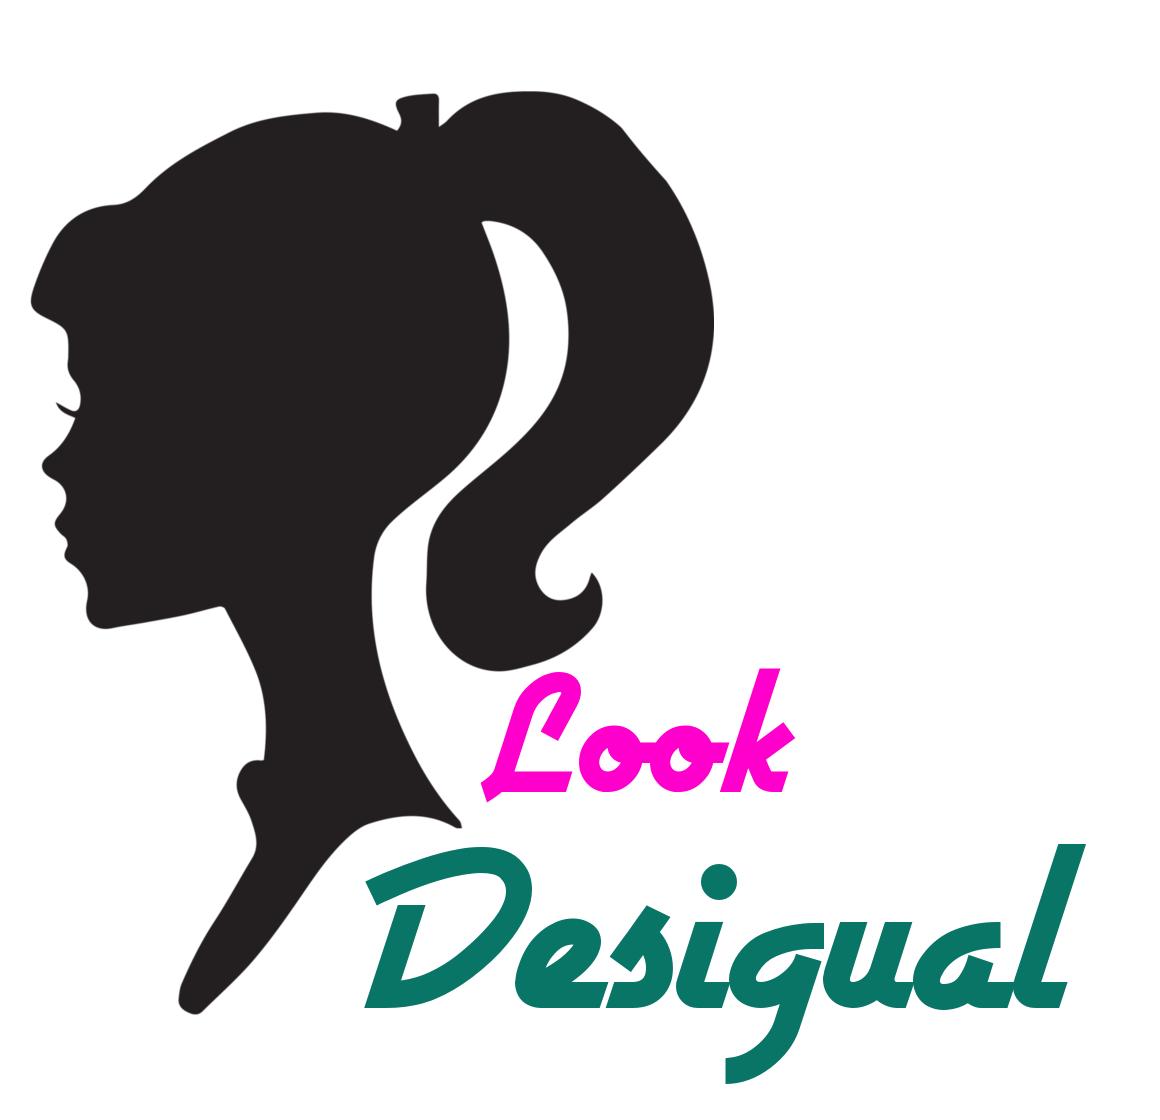 Store Logo Design for Look Desigual by Dhada Sibla.